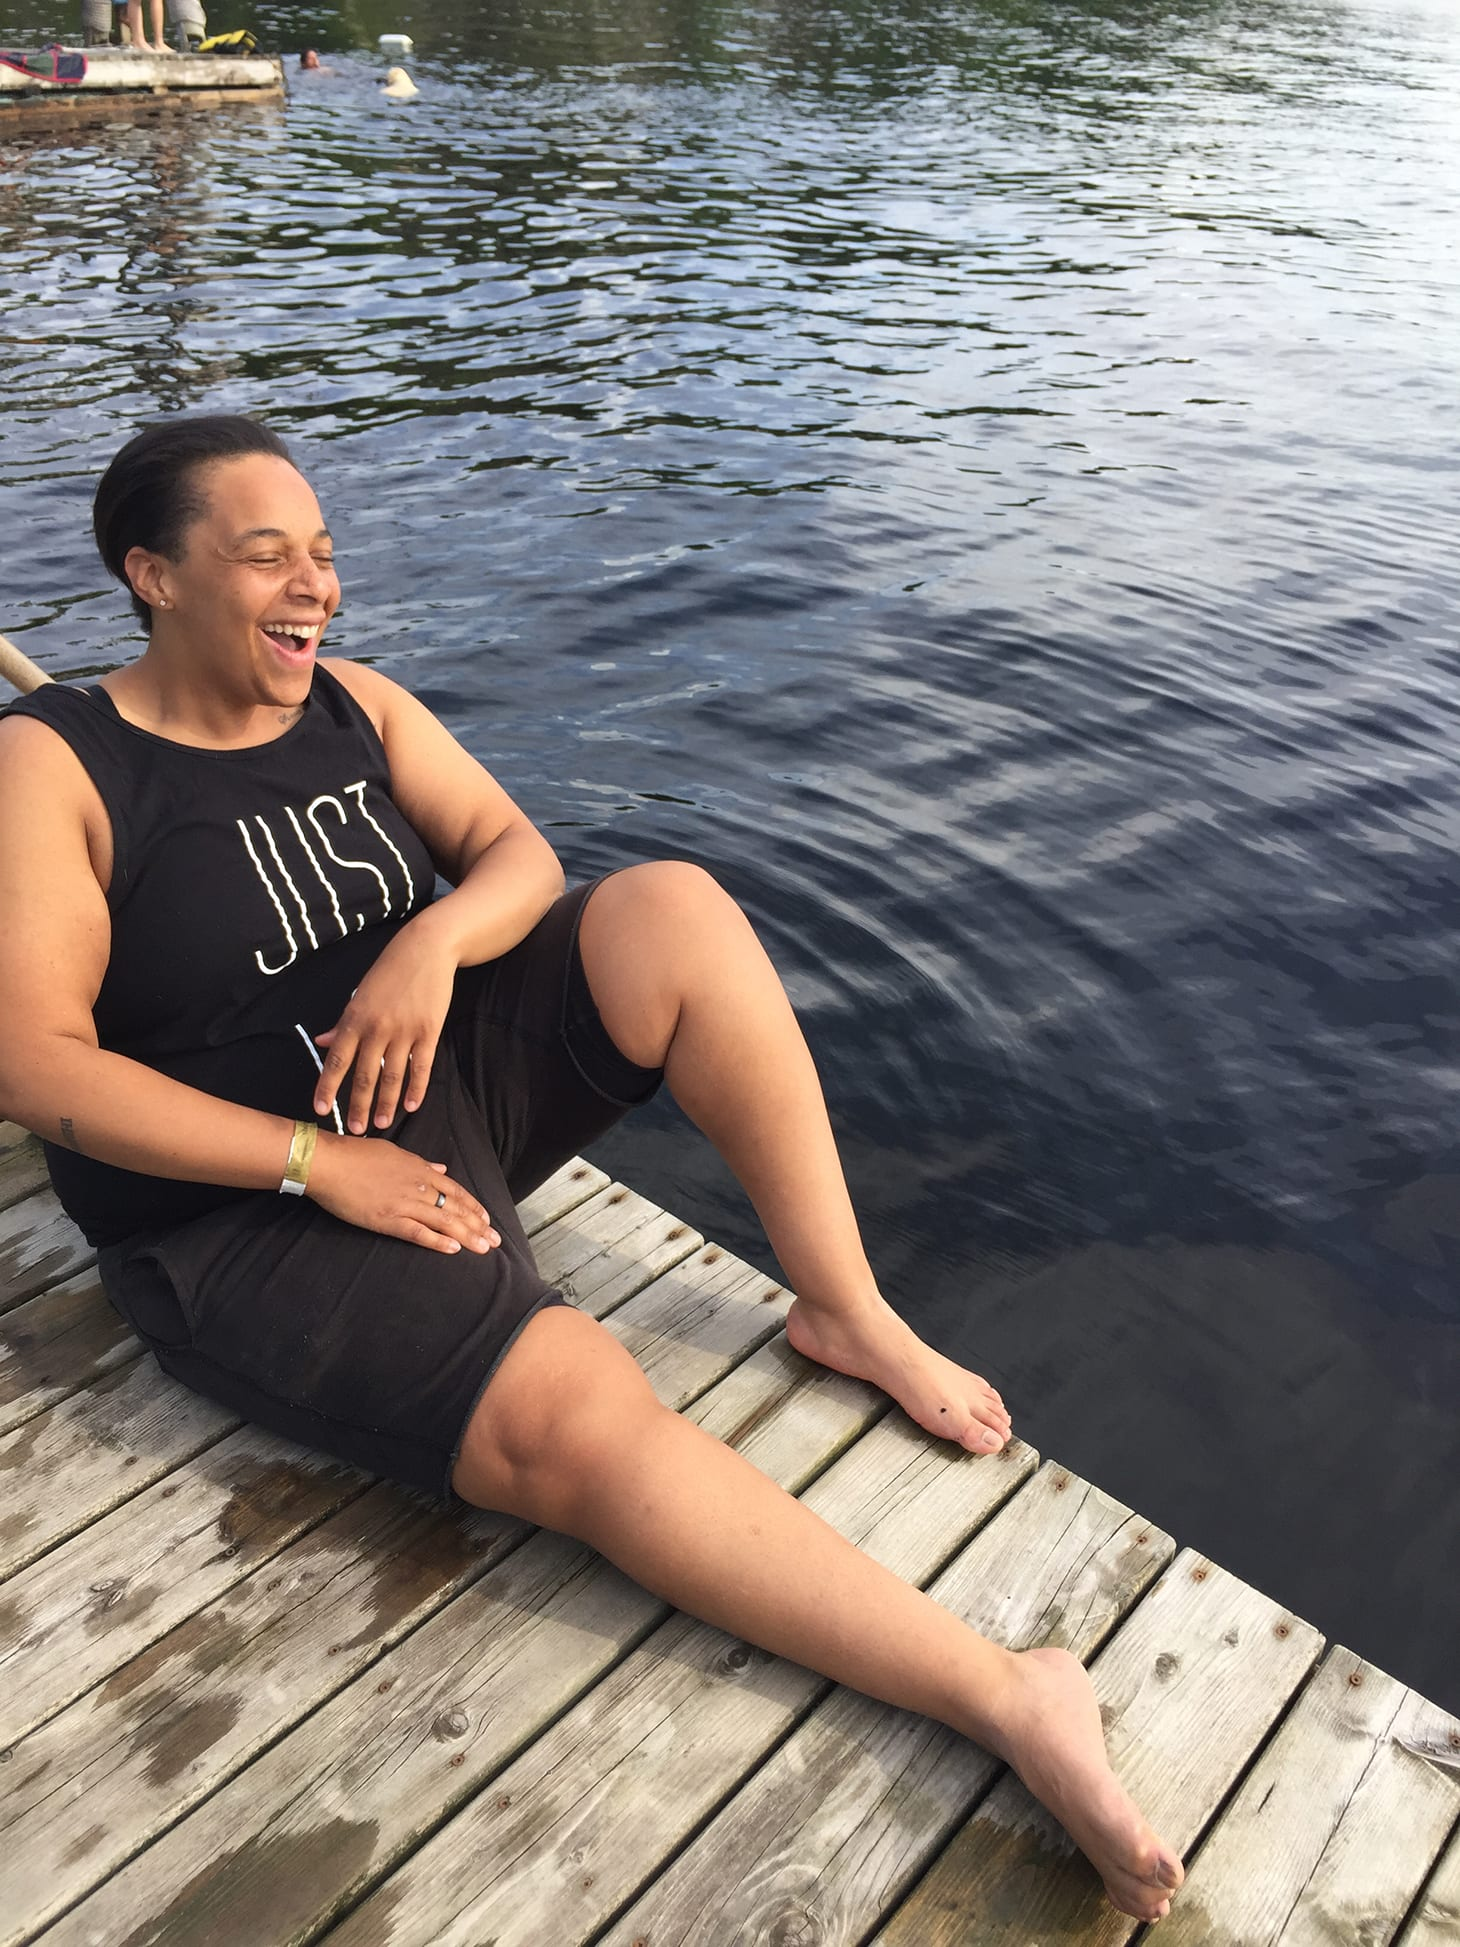 Health and wellness coach, Coach Carey on a dock.